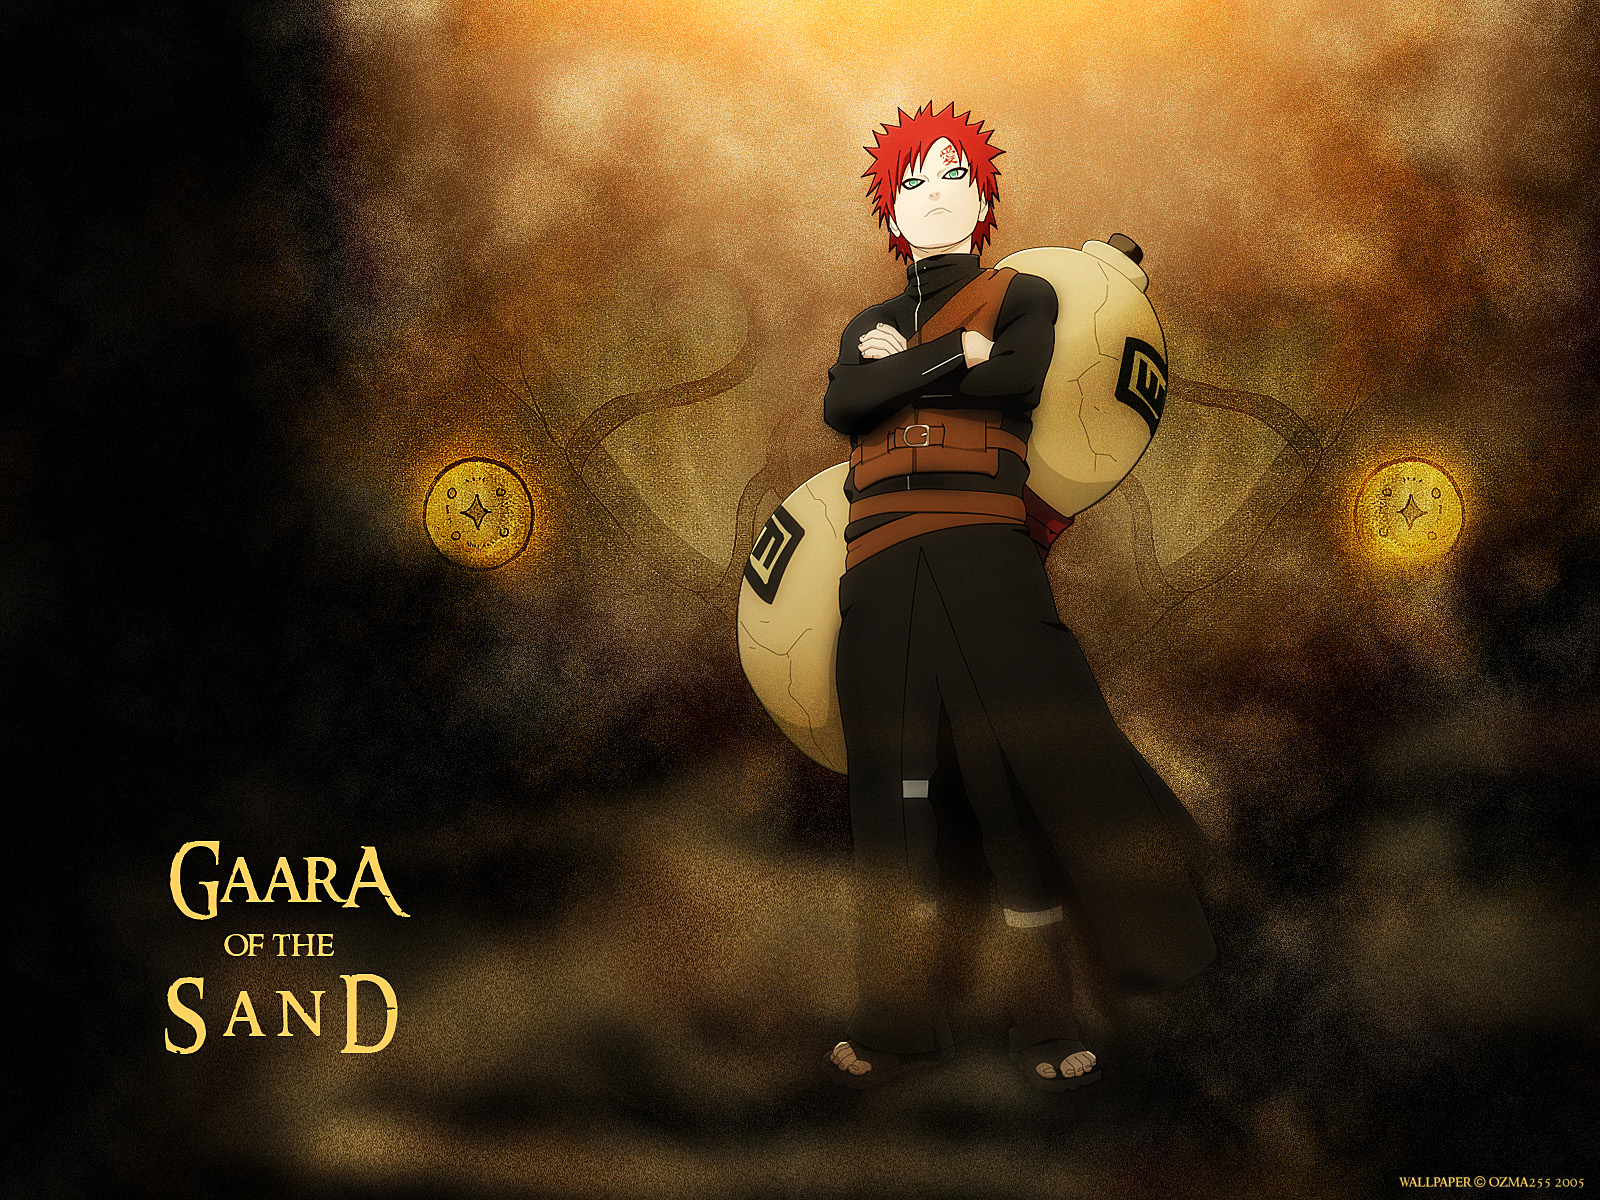 Download Anime Wallpaper Gaara HD Naruto Movie 1600x1200